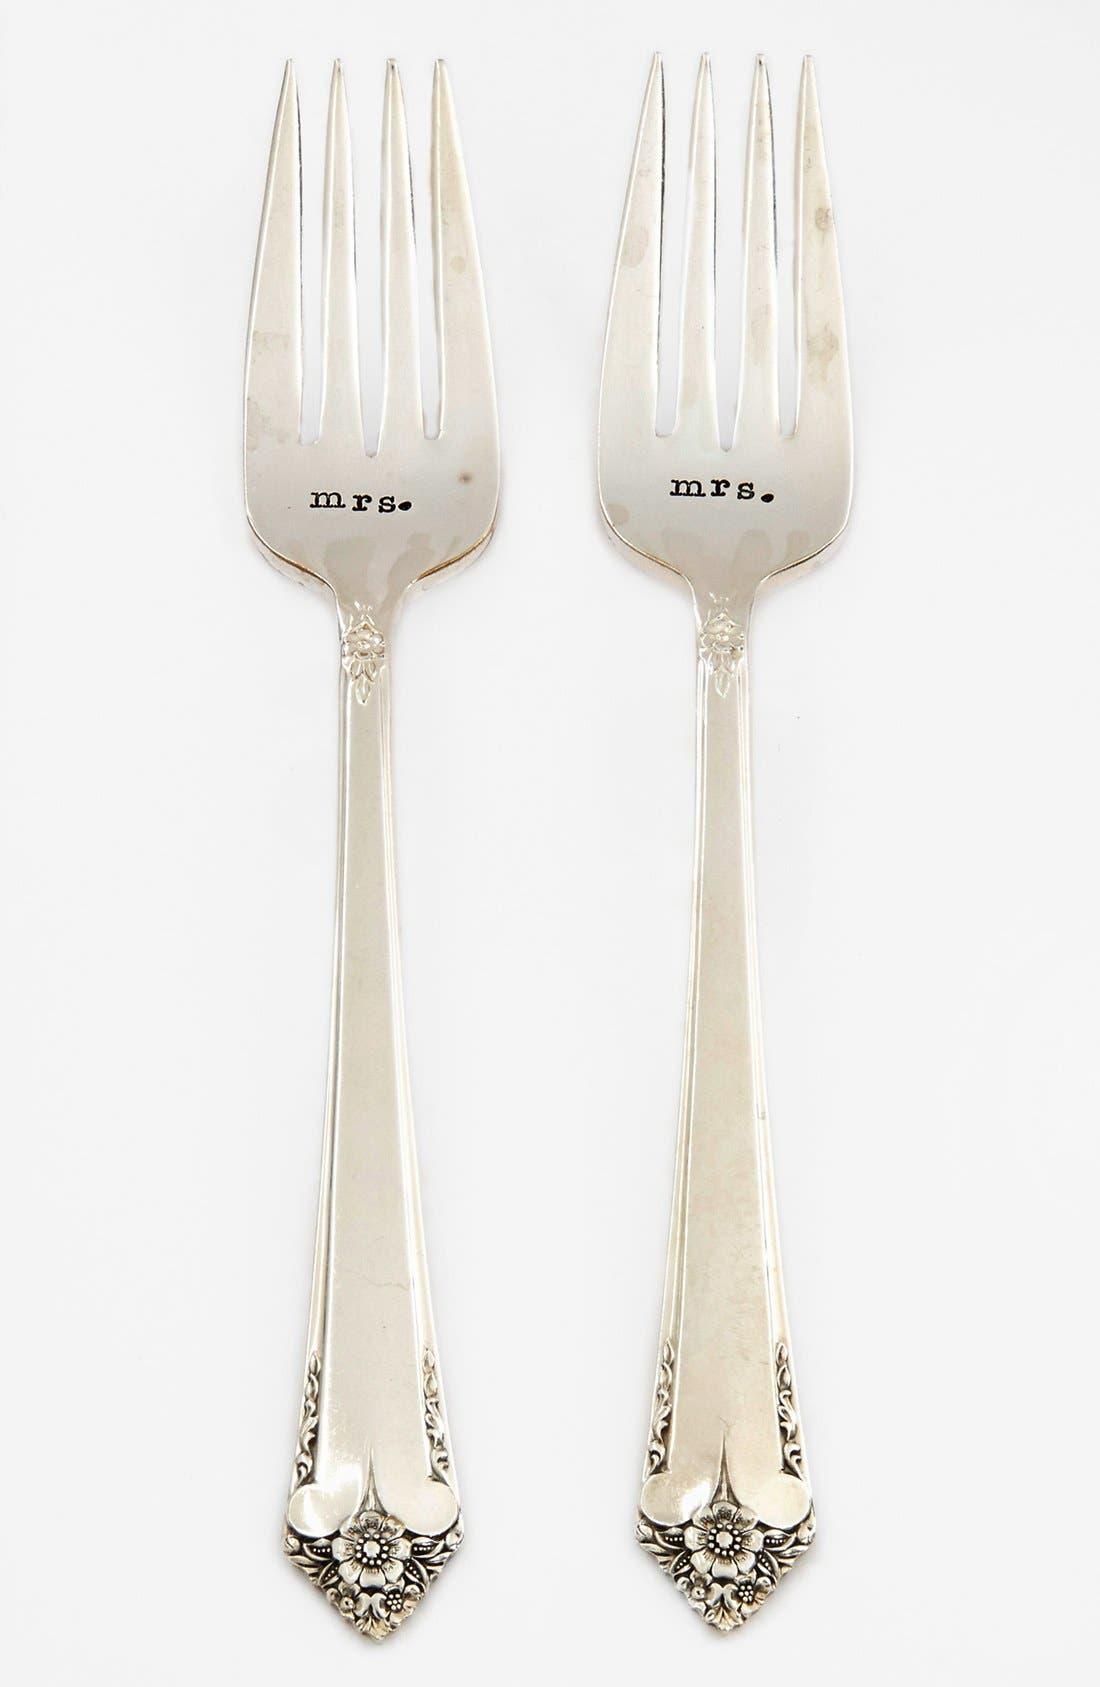 Main Image - Milk and Honey Luxuries 'Mrs. & Mrs.' Vintage Wedding Forks (Set of 2)